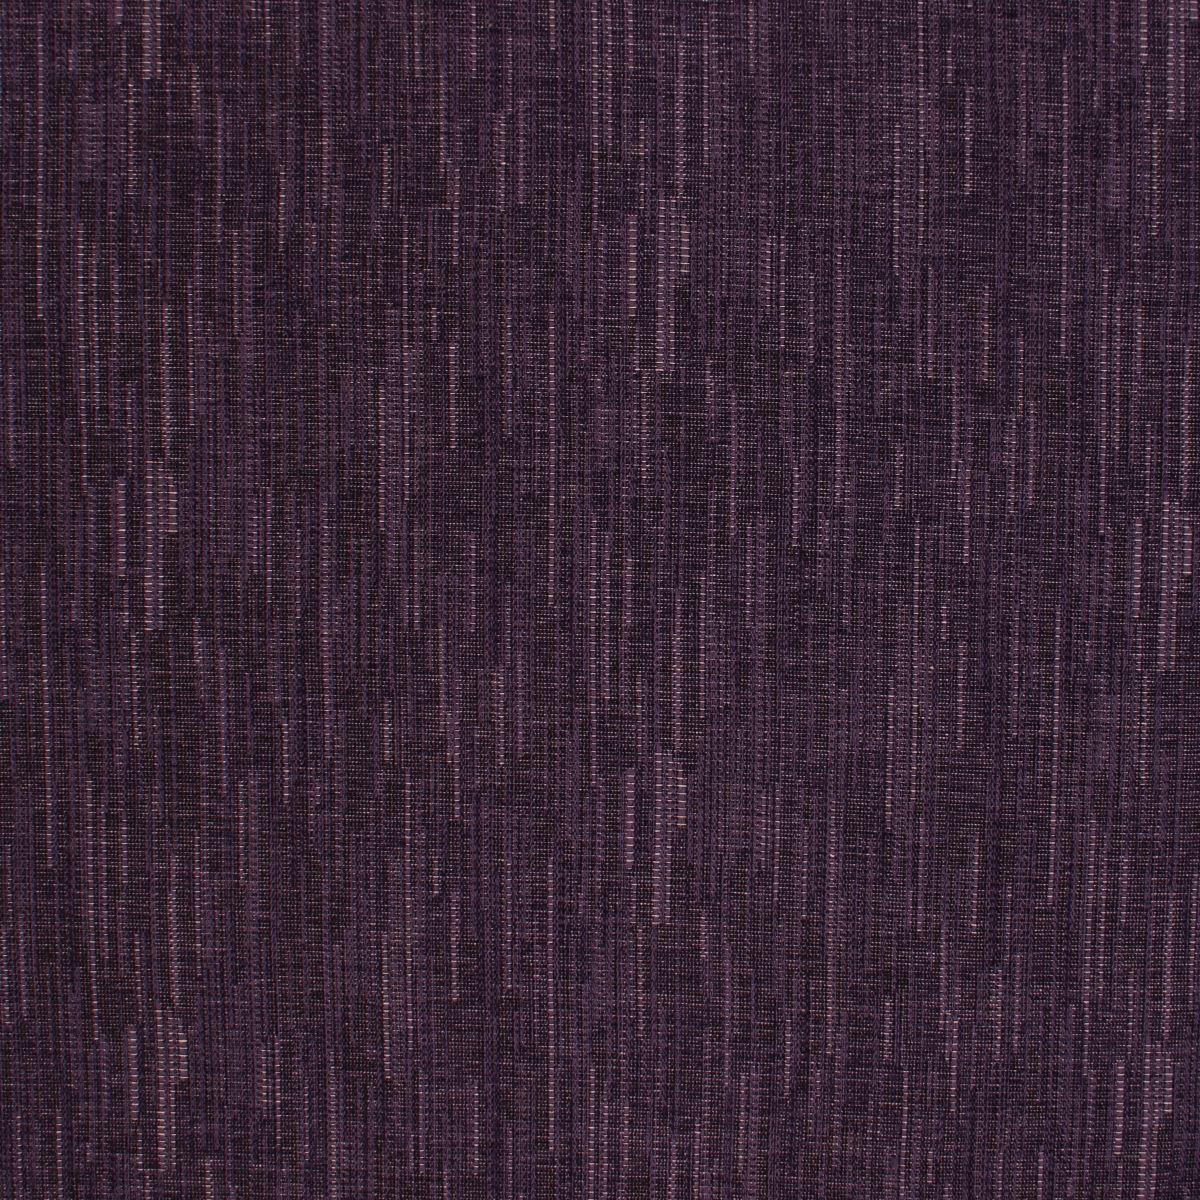 034-Chenille-034-Slubbed-Shabby-Worn-Look-Curtain-Cushion-Sofa-Upholstery-Fabric thumbnail 4